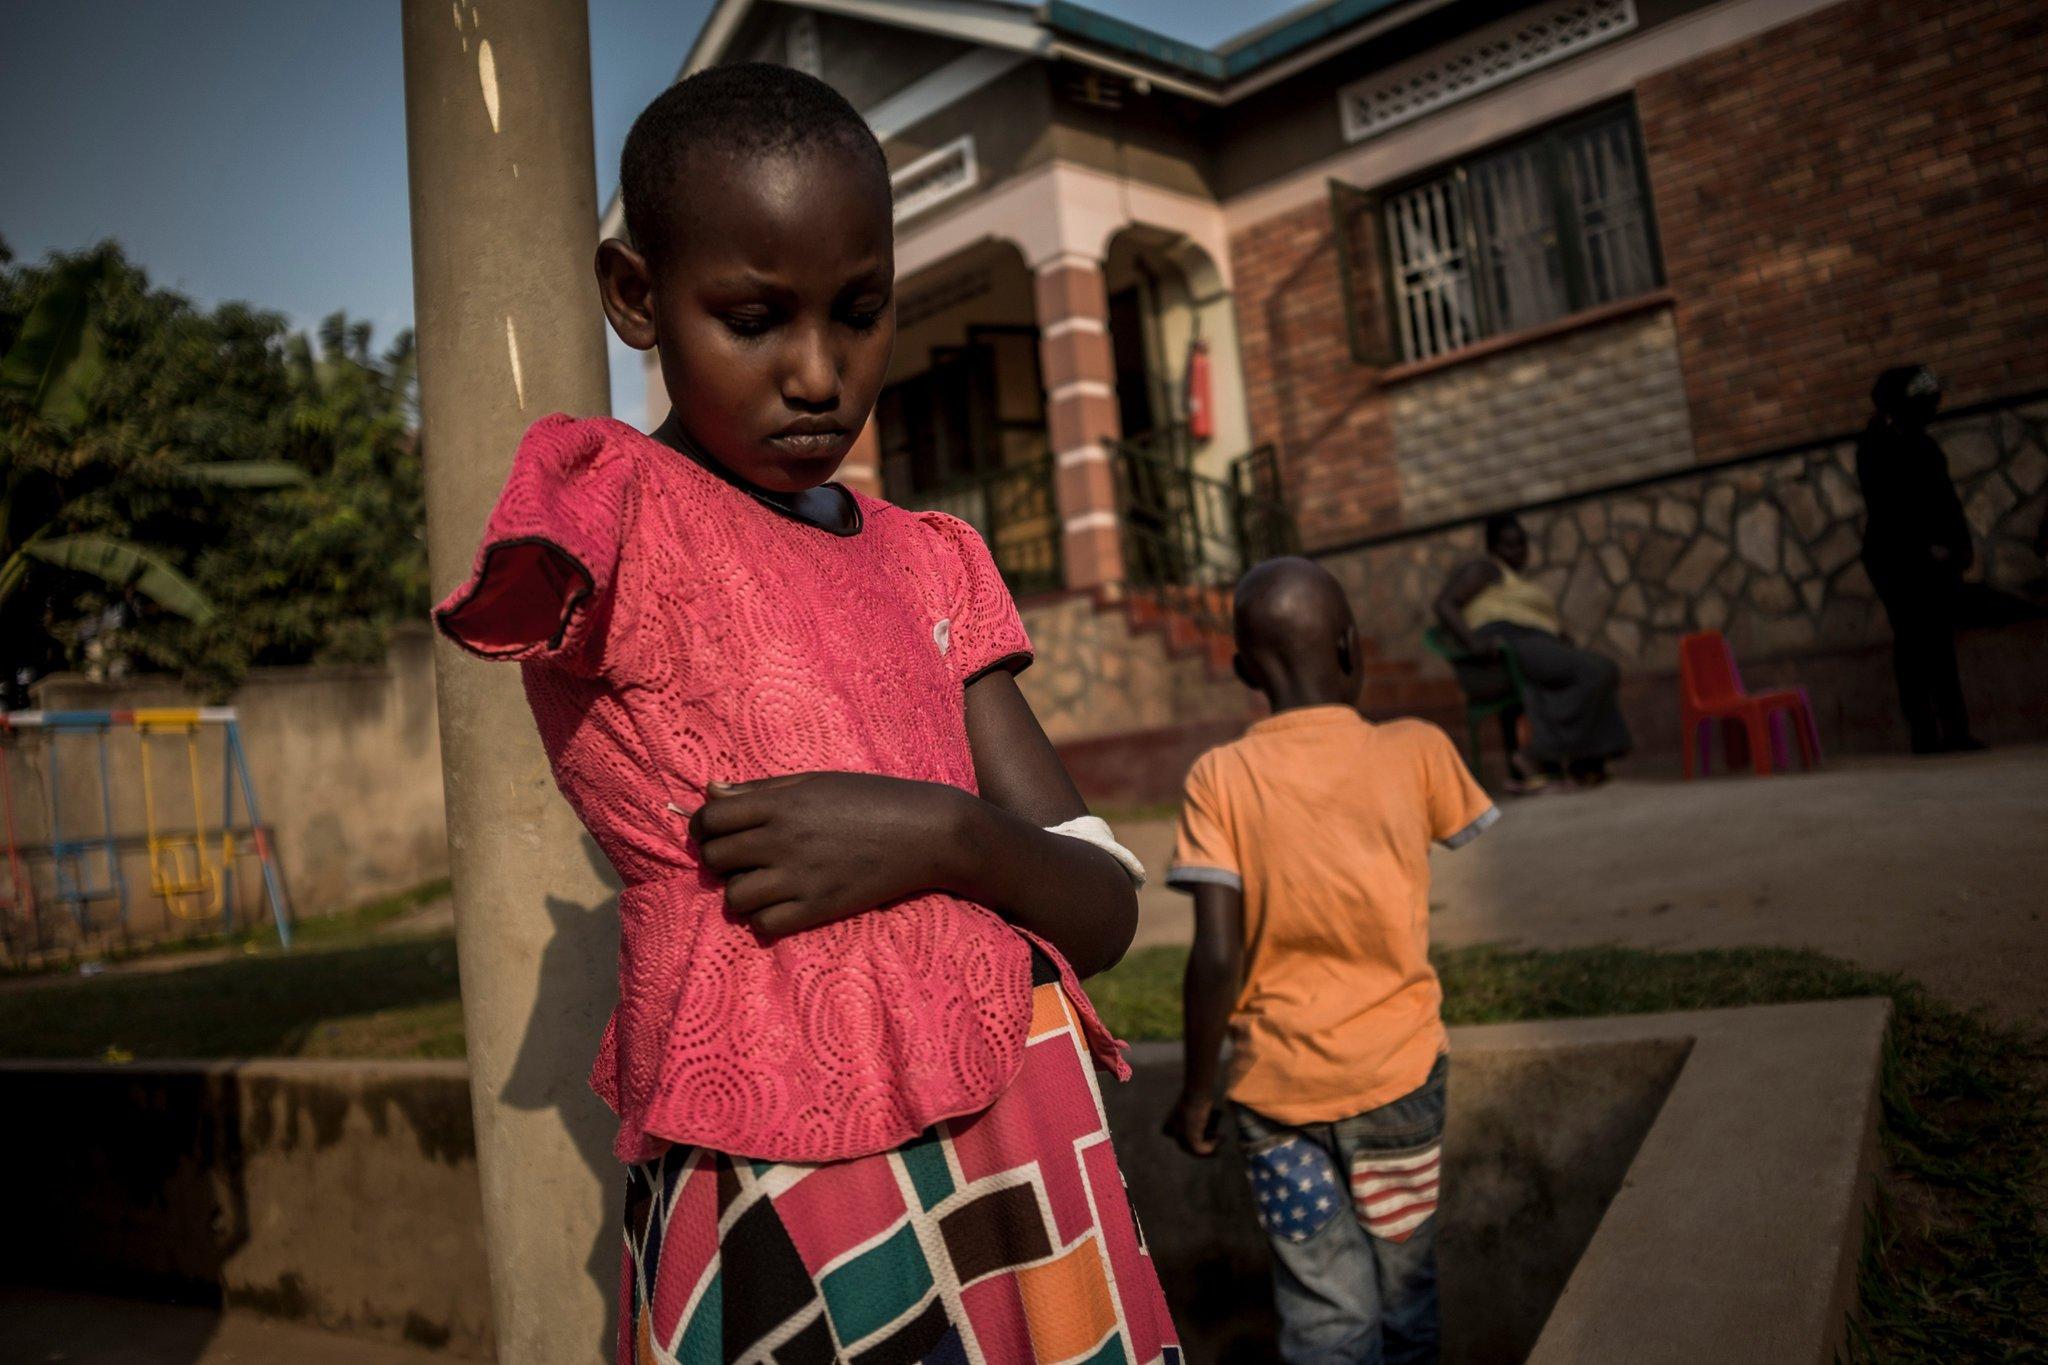 African Health, Cancer, African Health Care, KOLUMN Magazine, KOLUMN